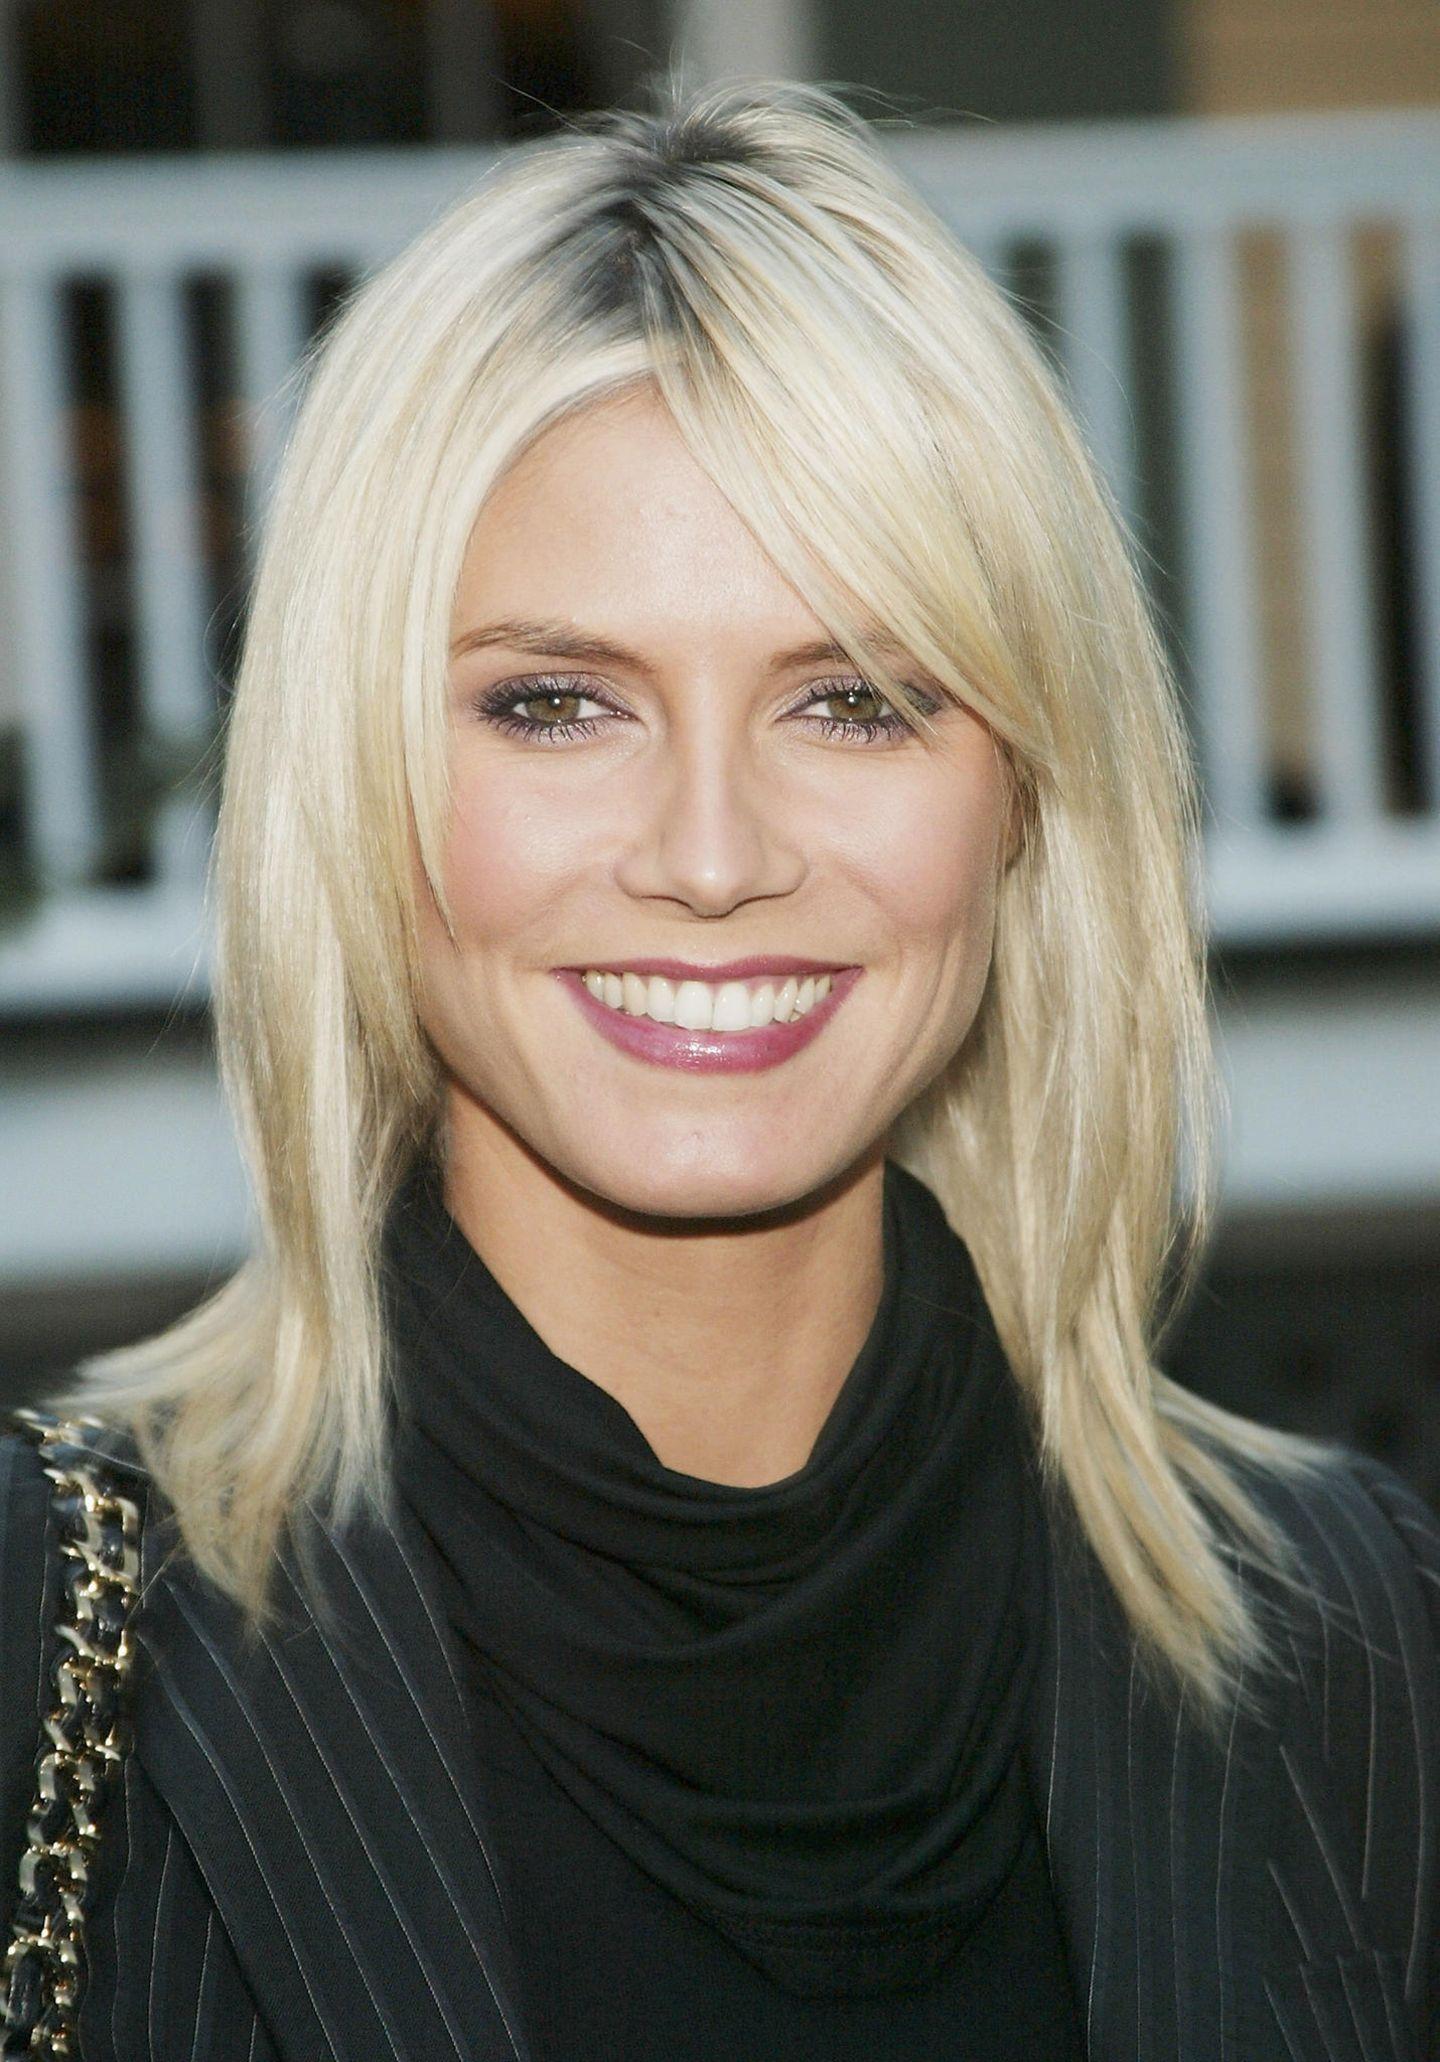 Heidi Klum: mit platinblonden Haaren